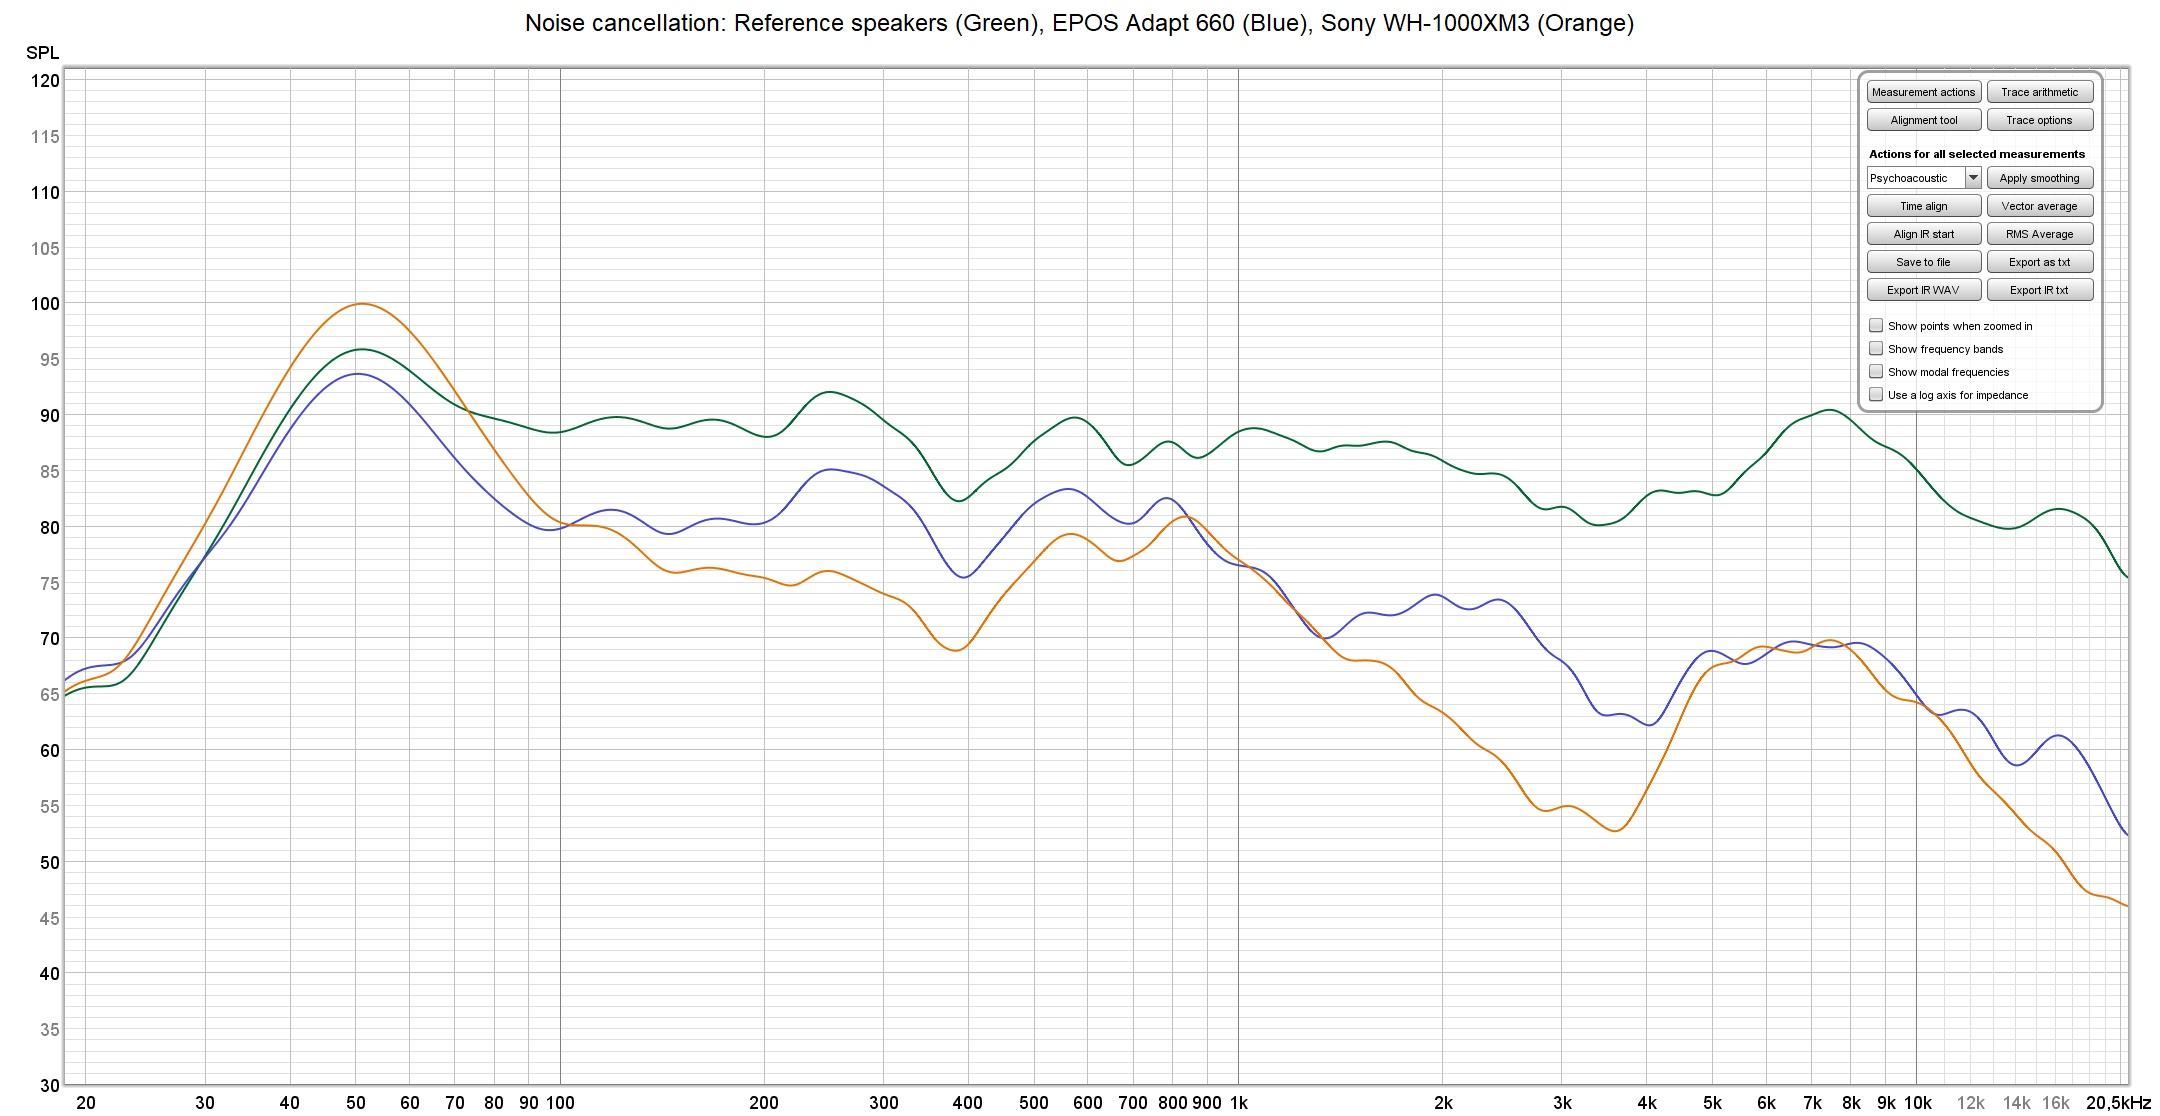 EPOS Adapt 660 vs Sony WH-1000XM3 noise cancelling